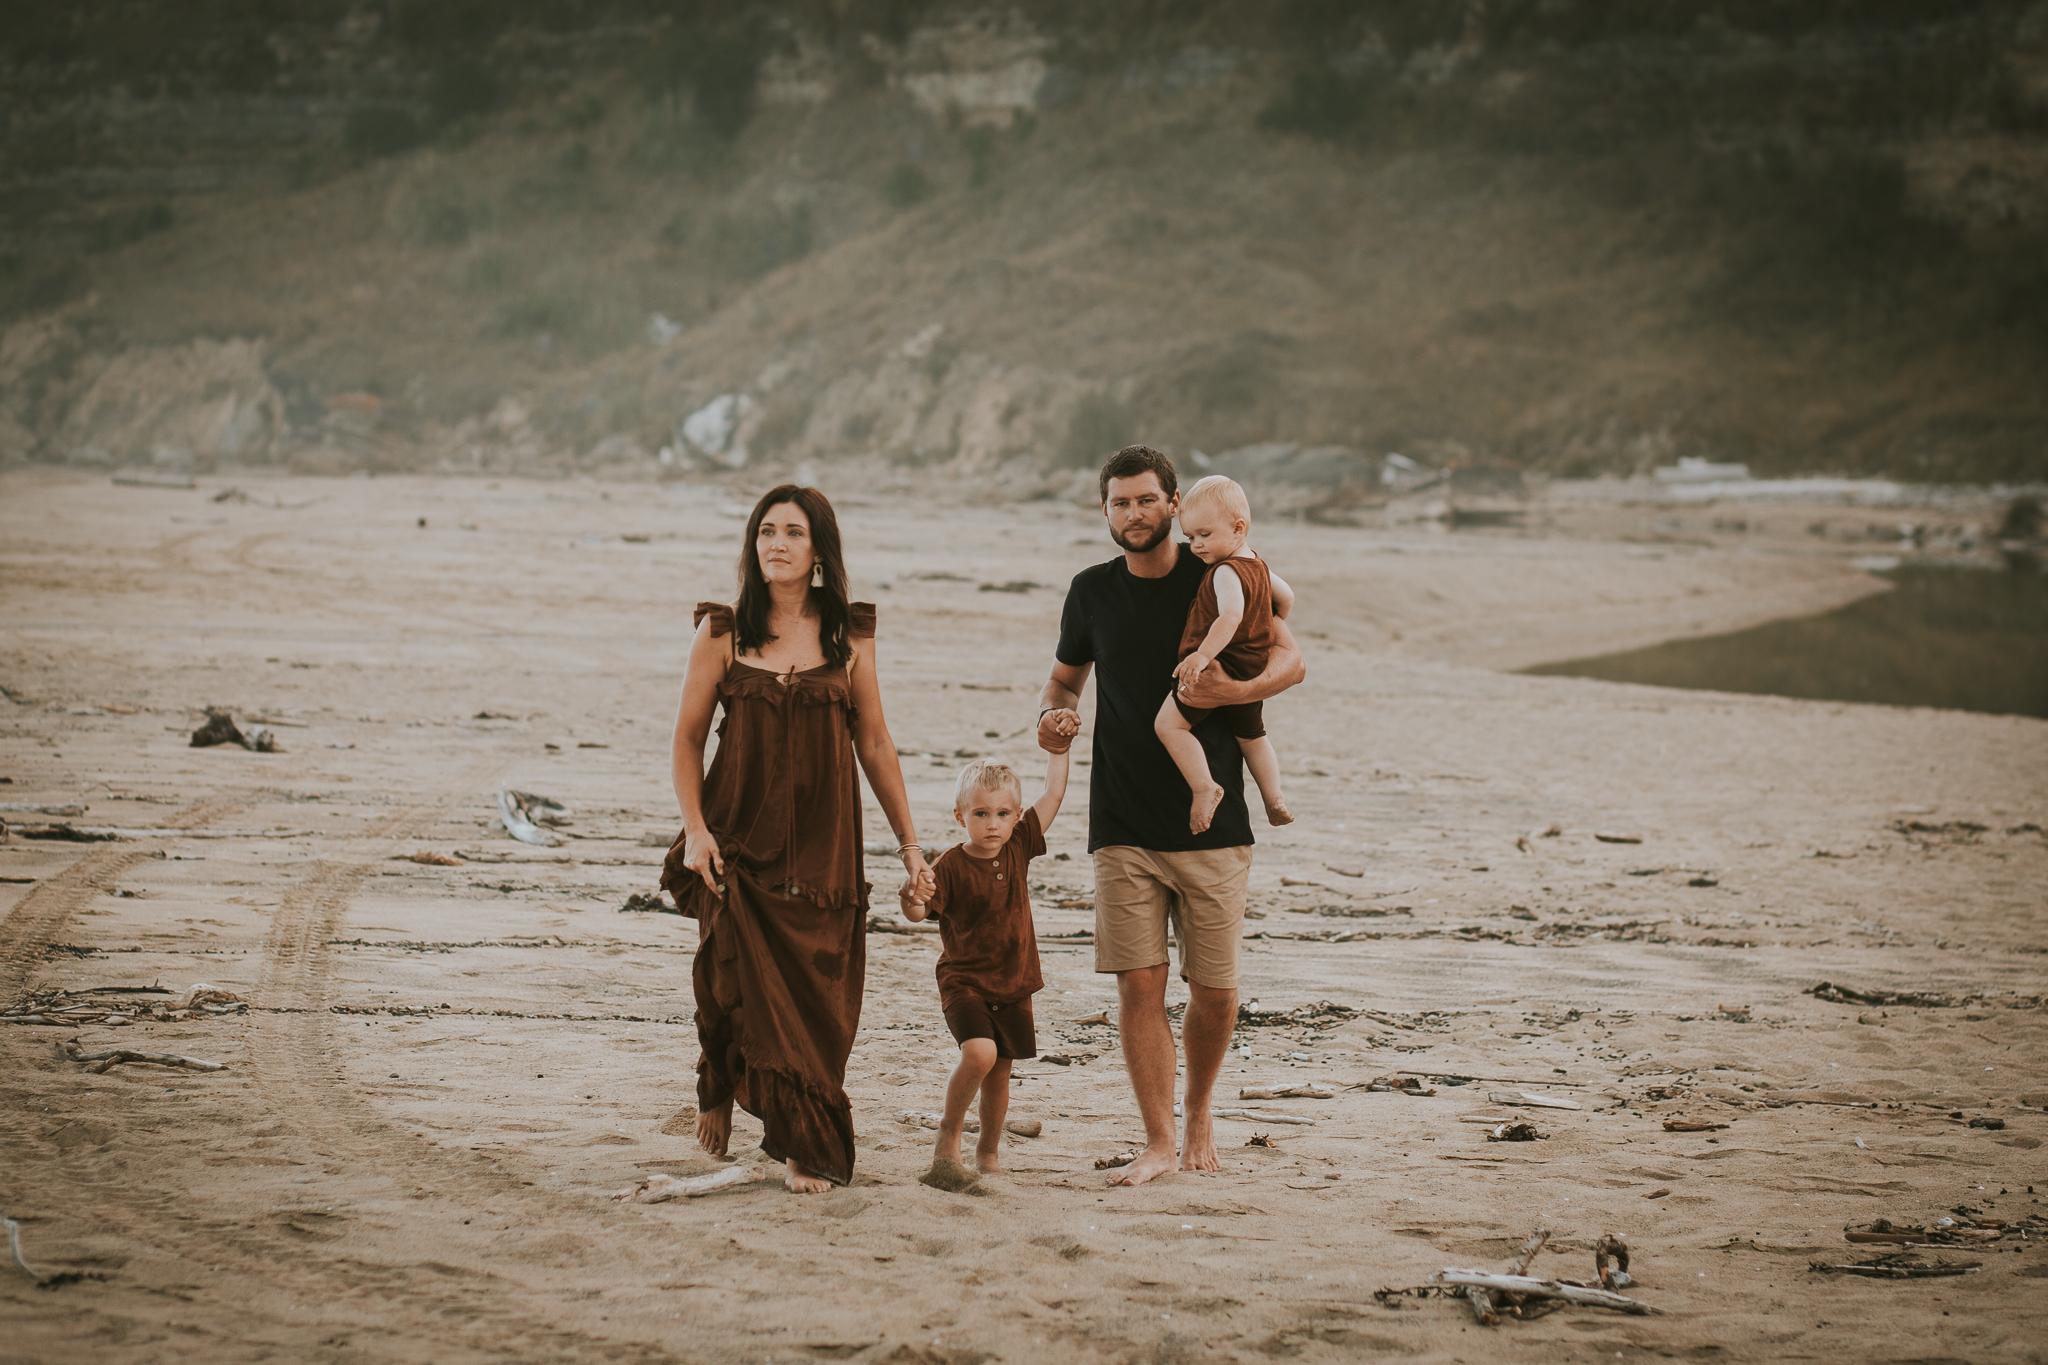 Nz Hawkes Bay Napier Wedding photographer waipatiki beach-79.jpg